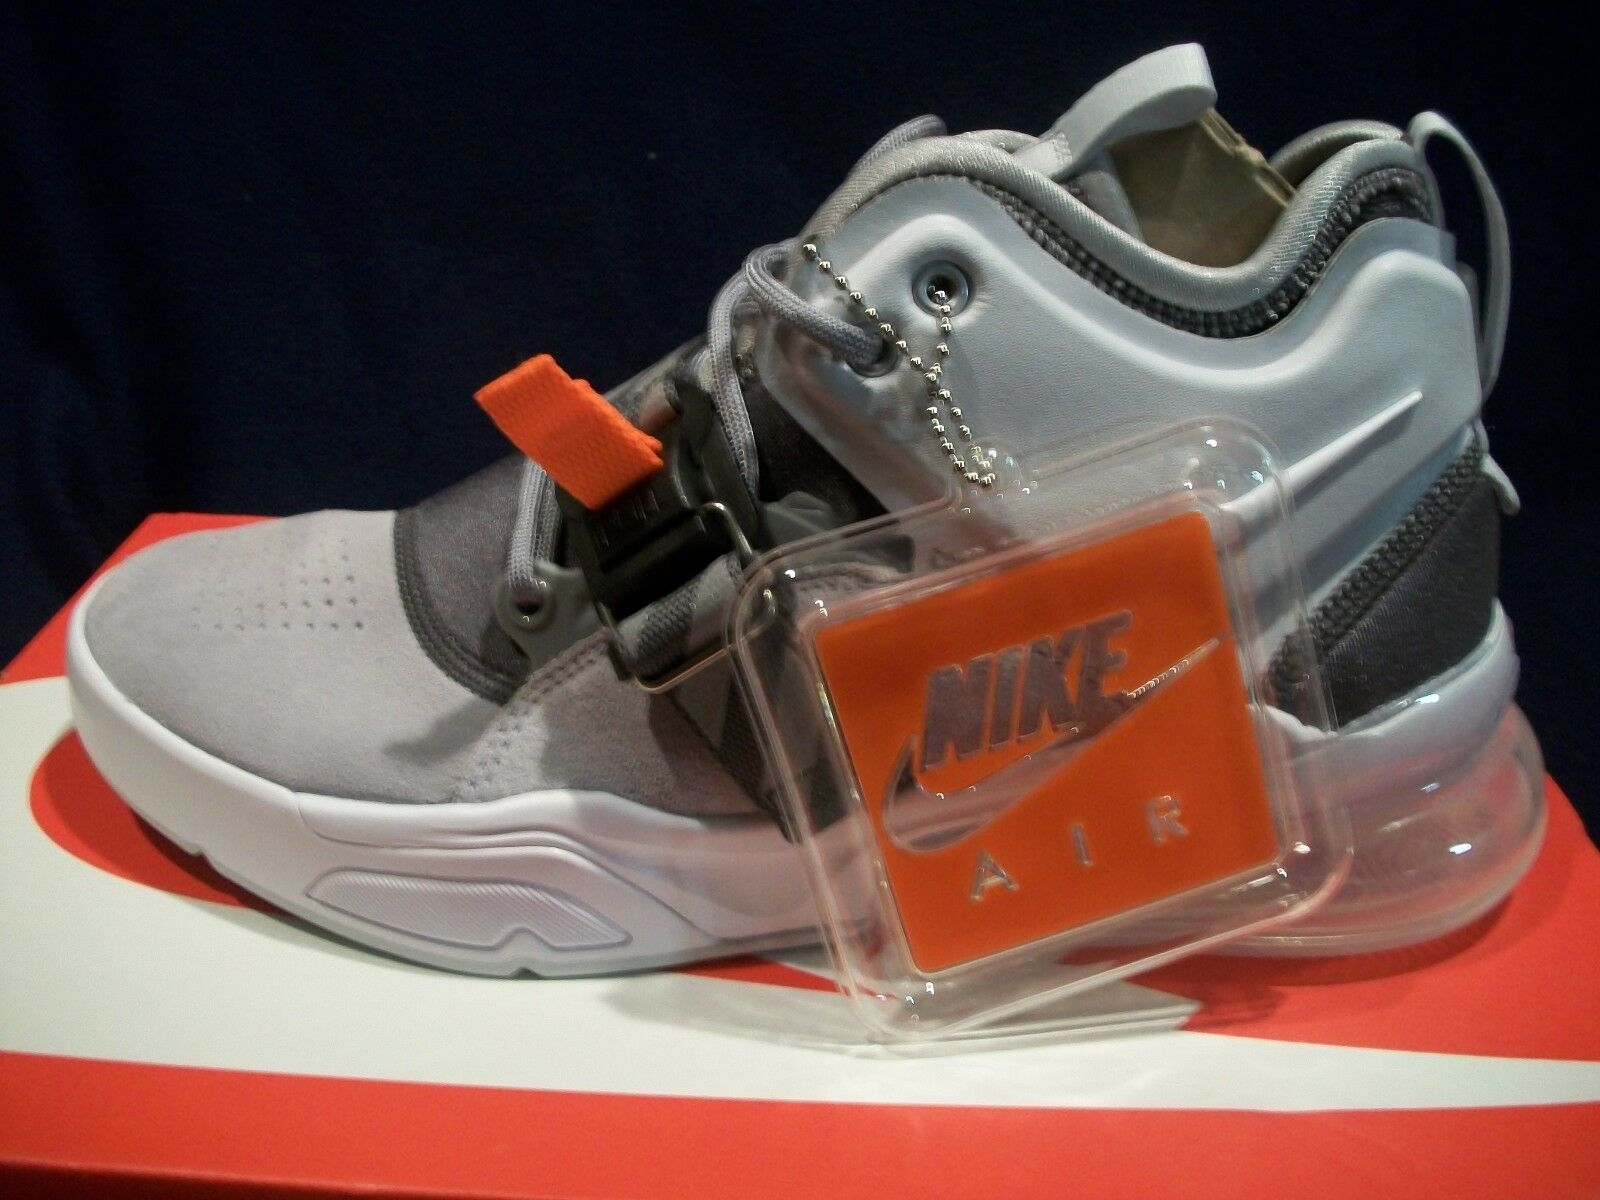 Nike air force 270 lupo grigio / bianco grigio scuro uomini scarpe ah6772 002 41